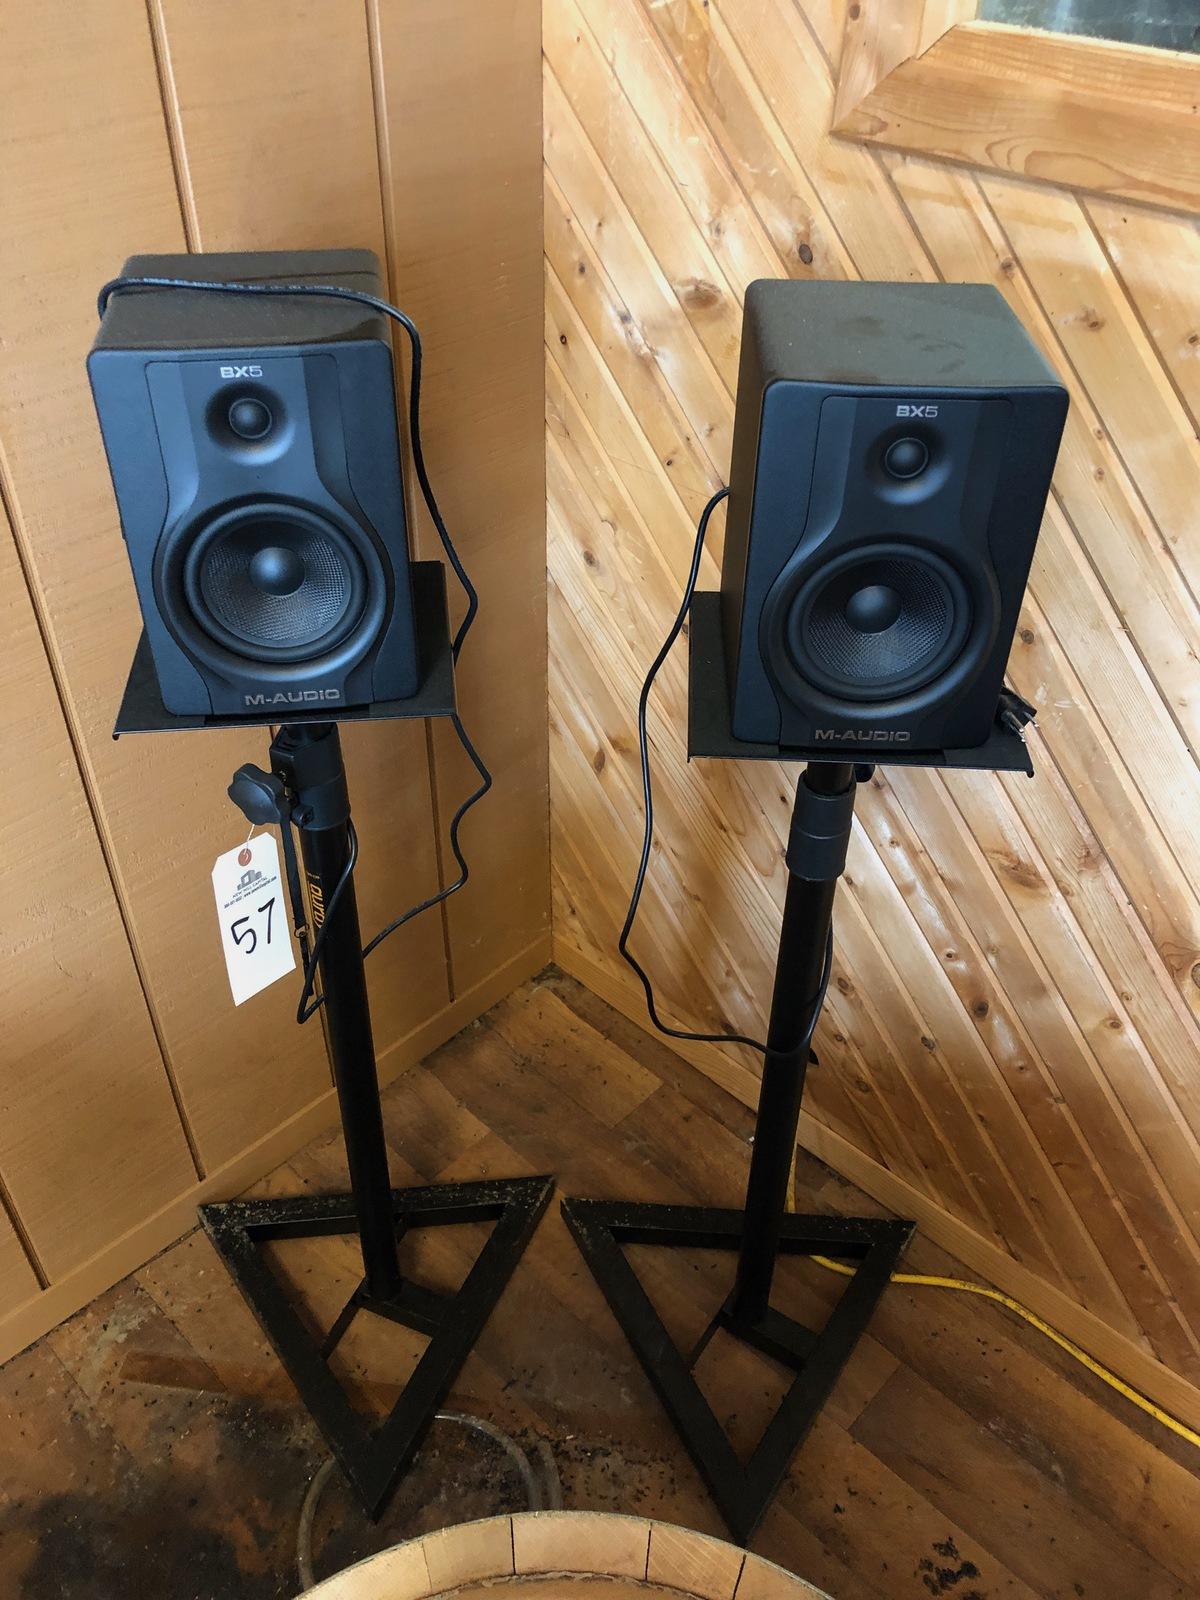 Lot 57 - (2) M-Audio Speakers   Rig Fee: $50 or HC